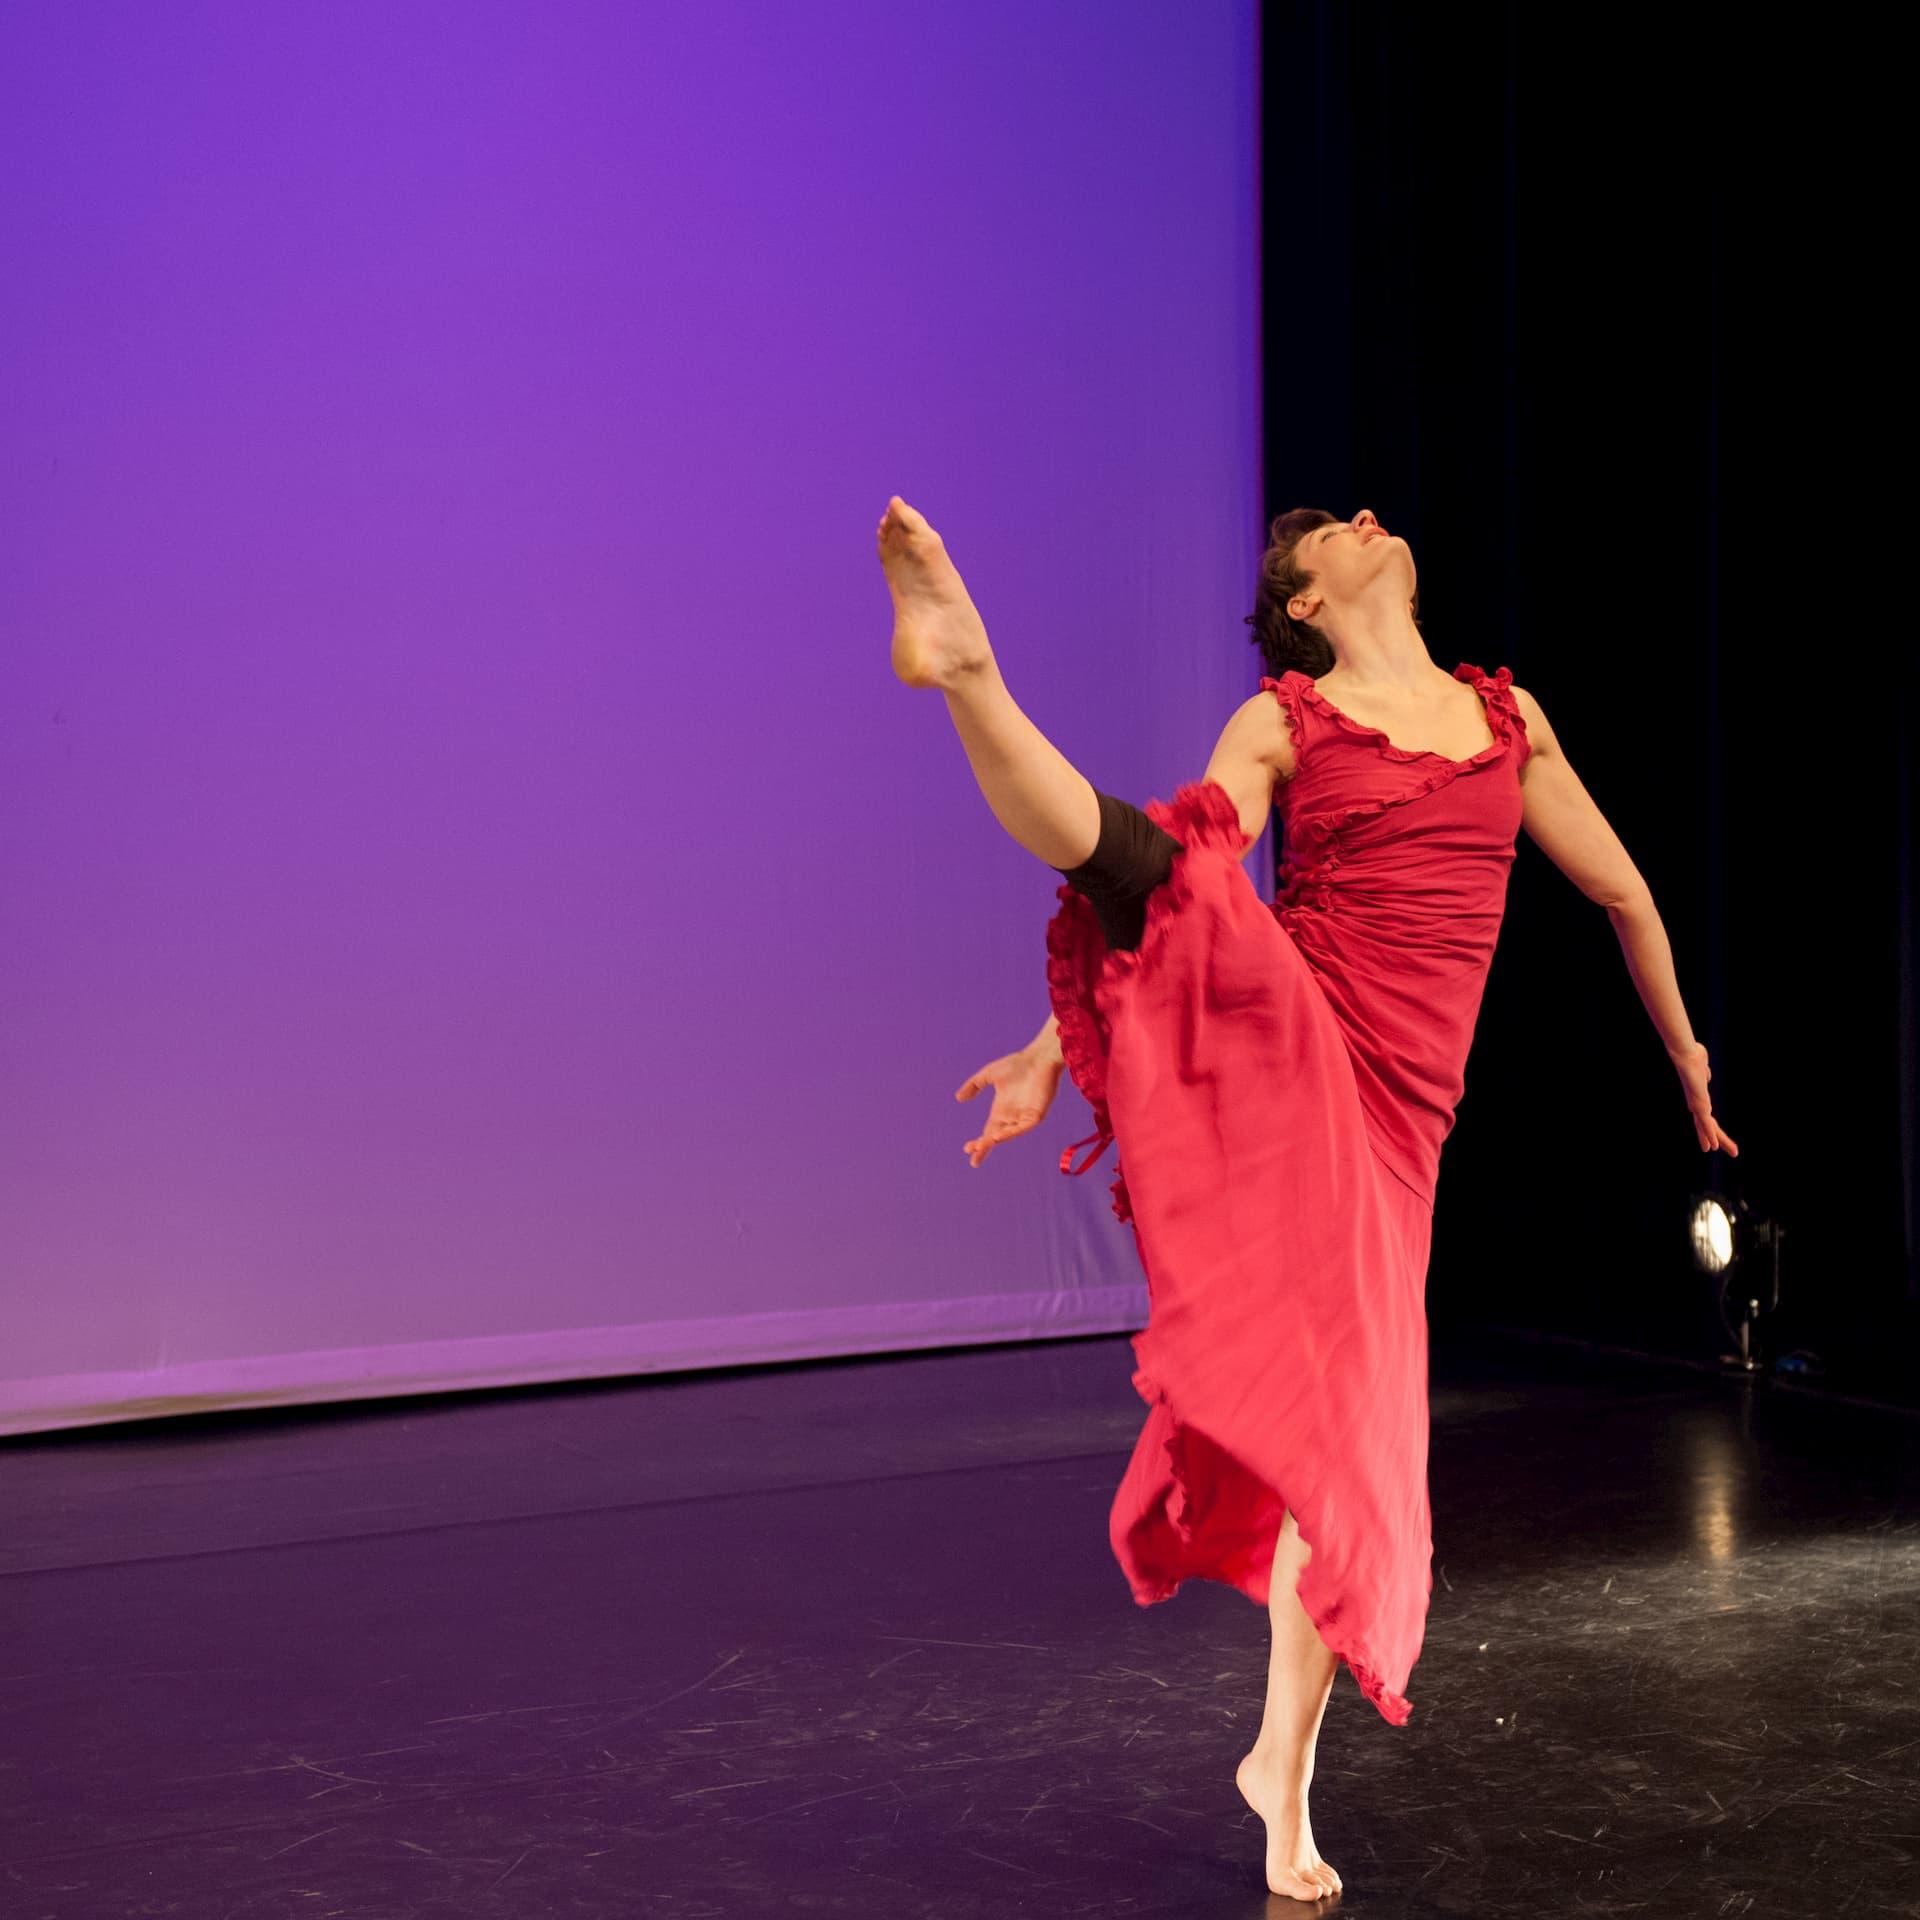 fotograaf Hilde Sneep. Voorstelling Connect van Christian Dance Company. Choreografie: Martina Tak